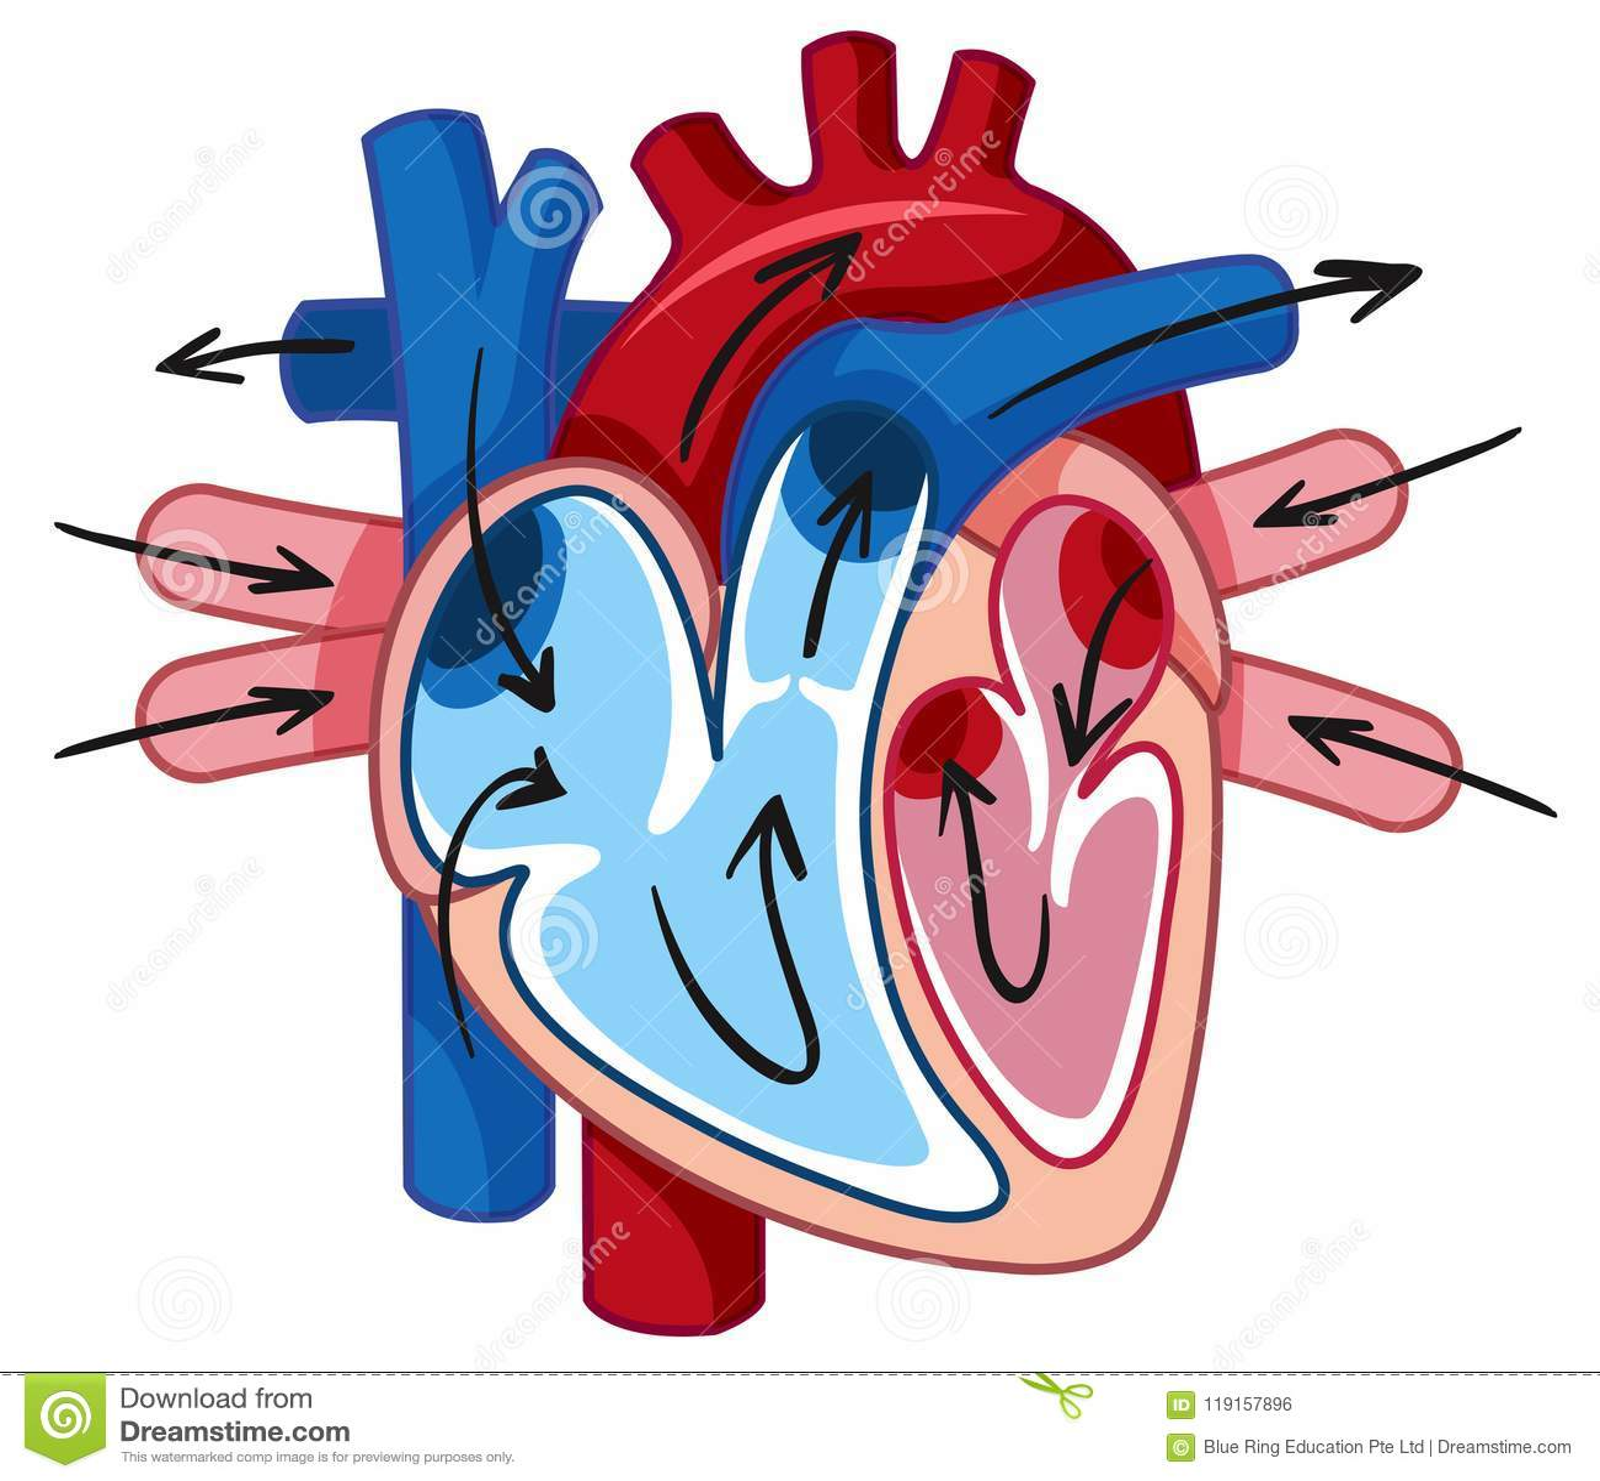 Coronary Arteries And Plaque Formation Cartoon Vector